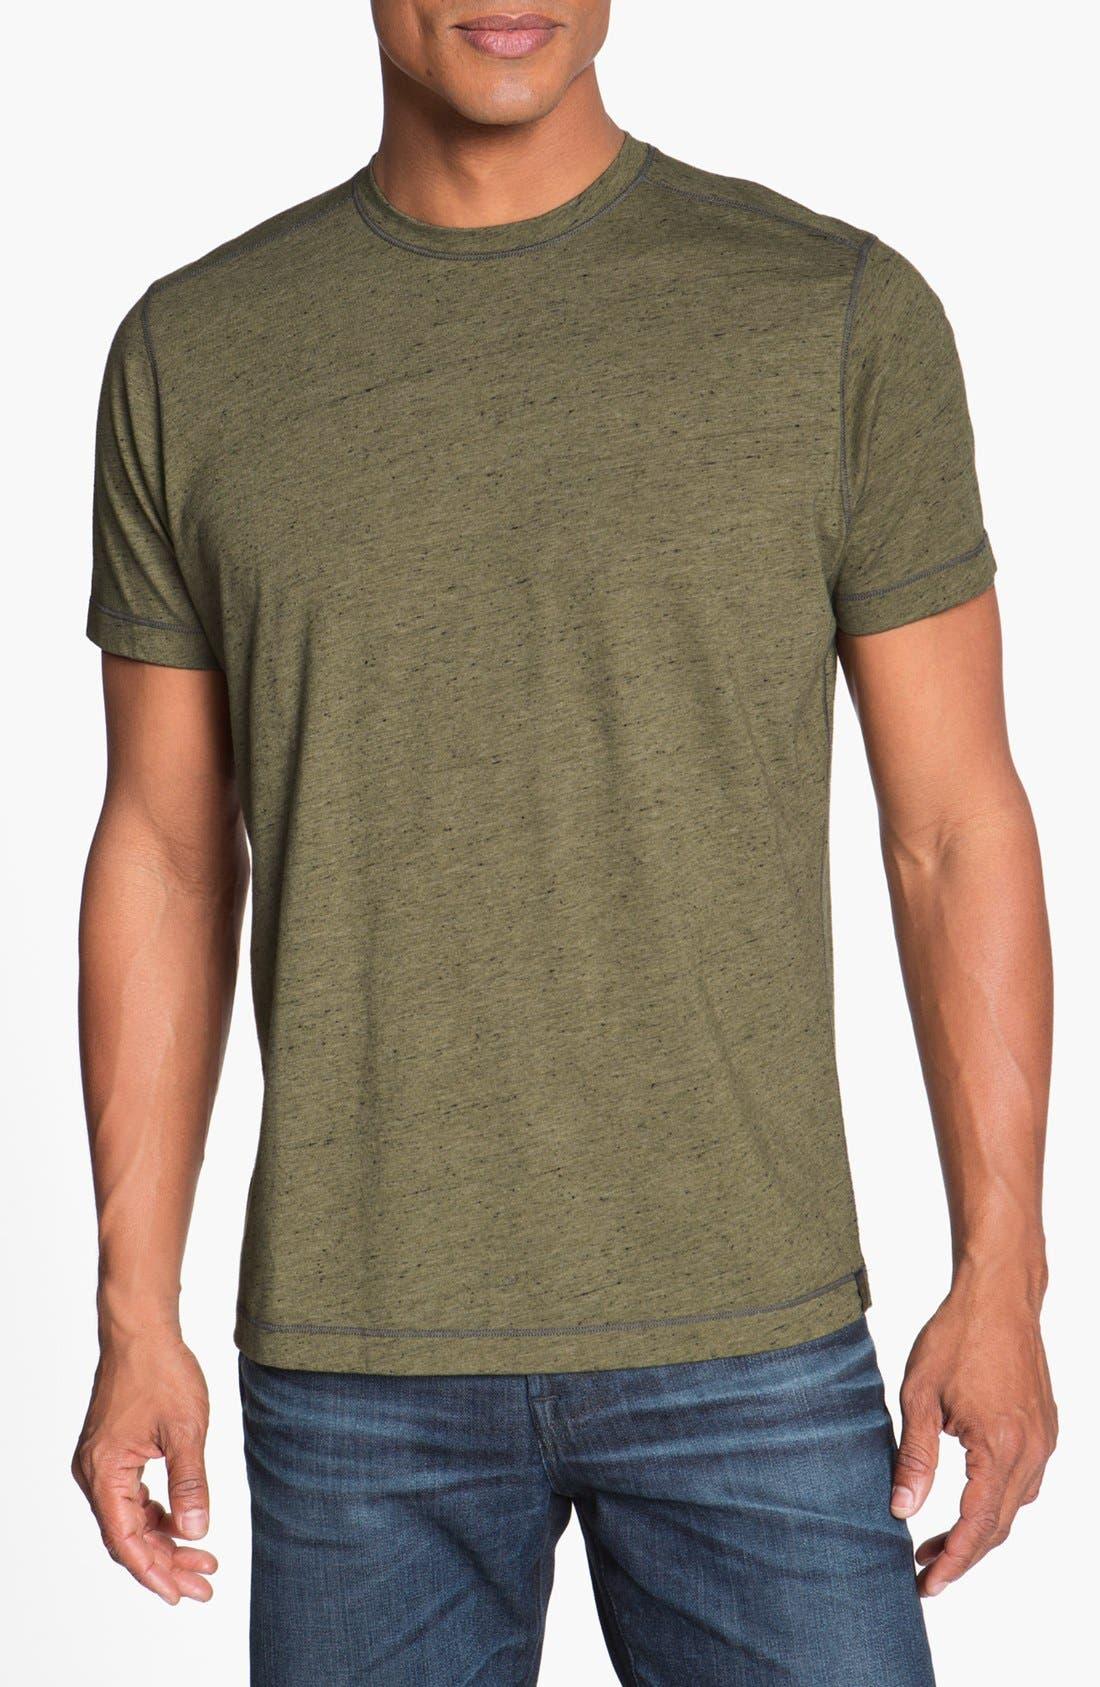 Alternate Image 1 Selected - Agave Crewneck T-Shirt